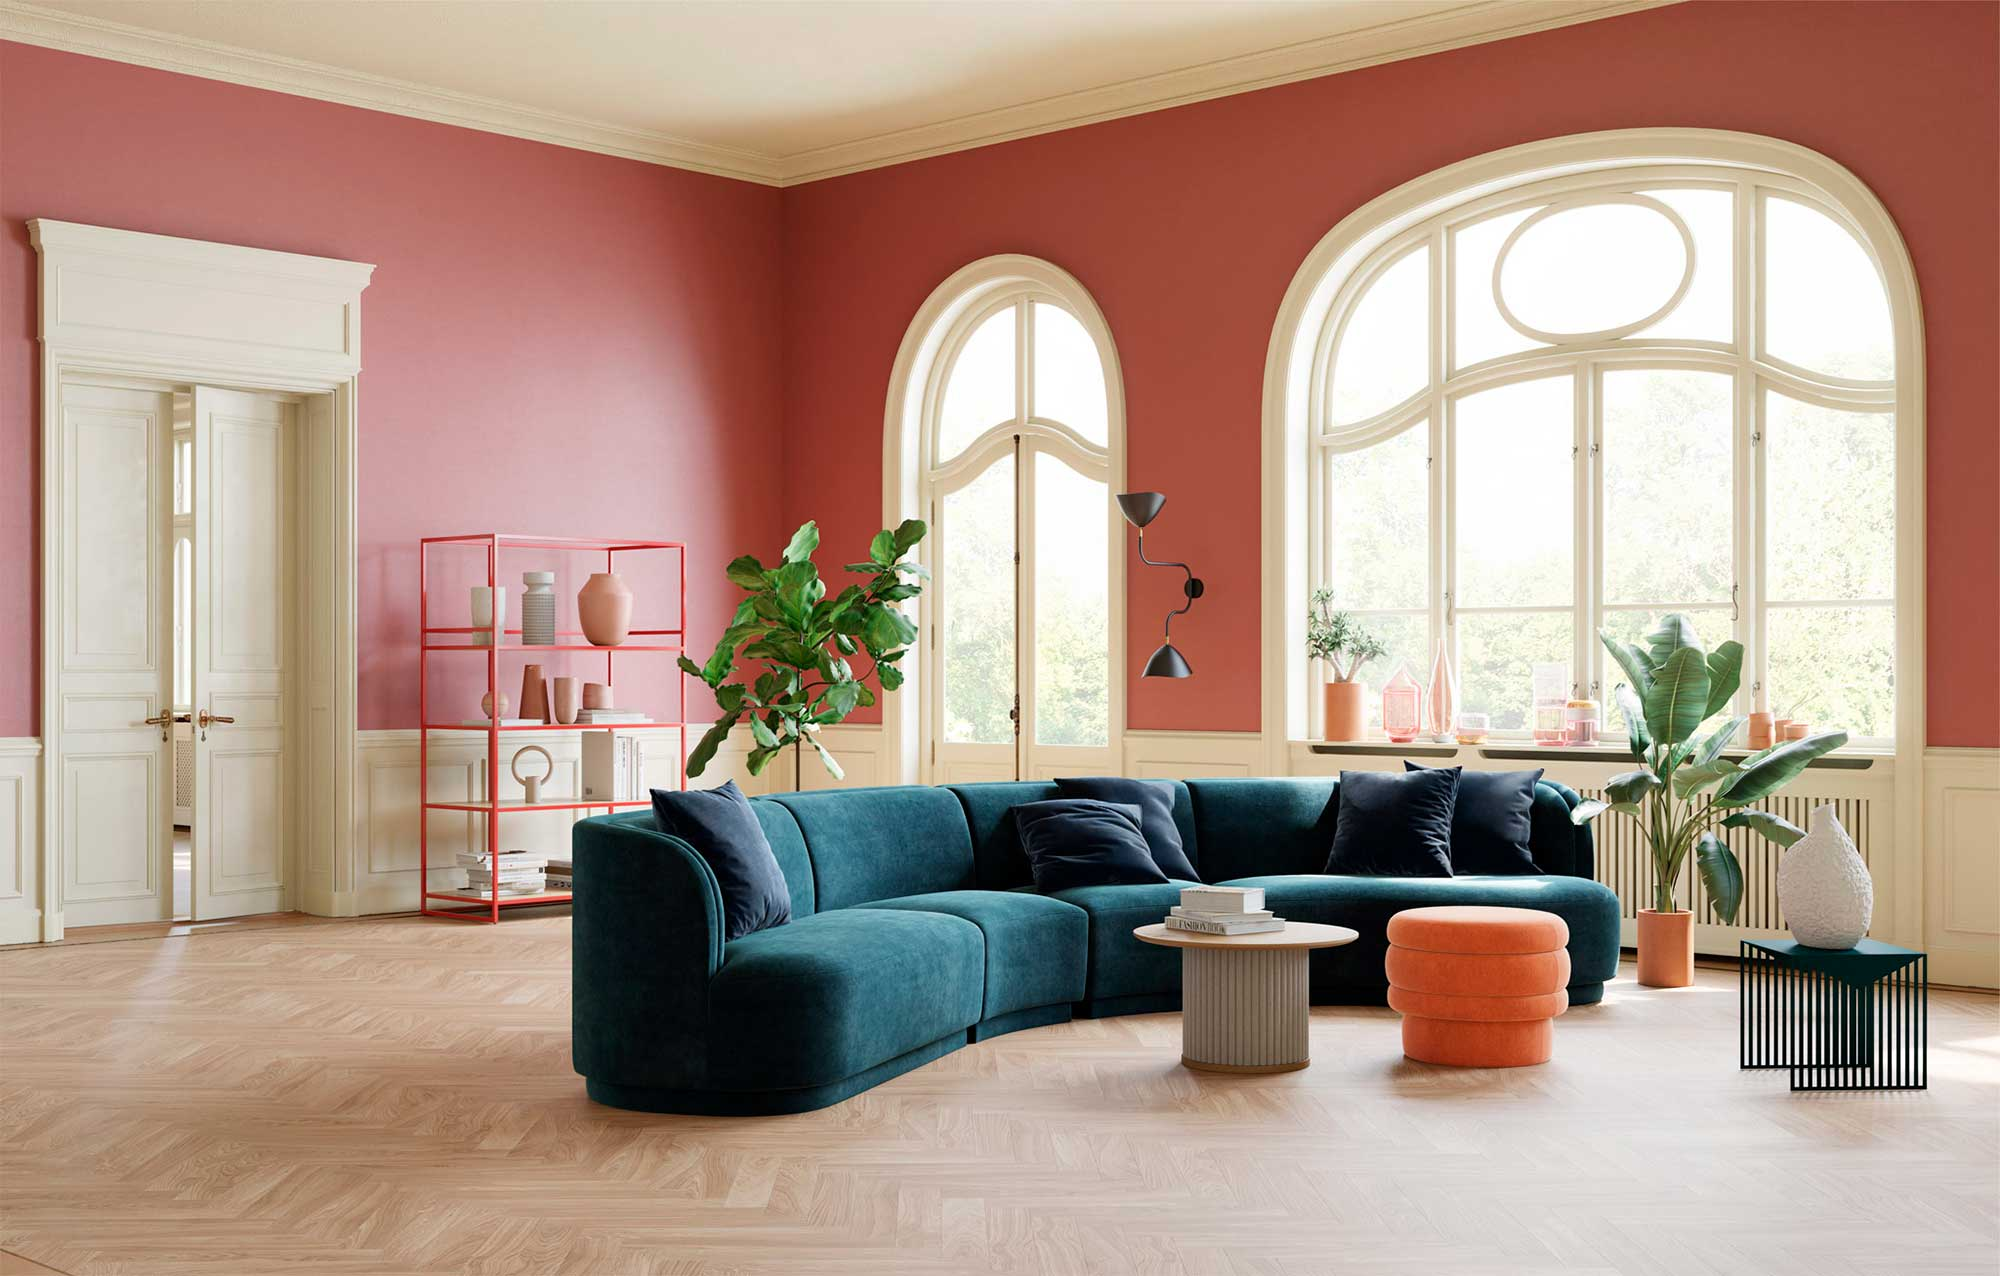 Sofa in modernem Altbau, farbenfroh bunt